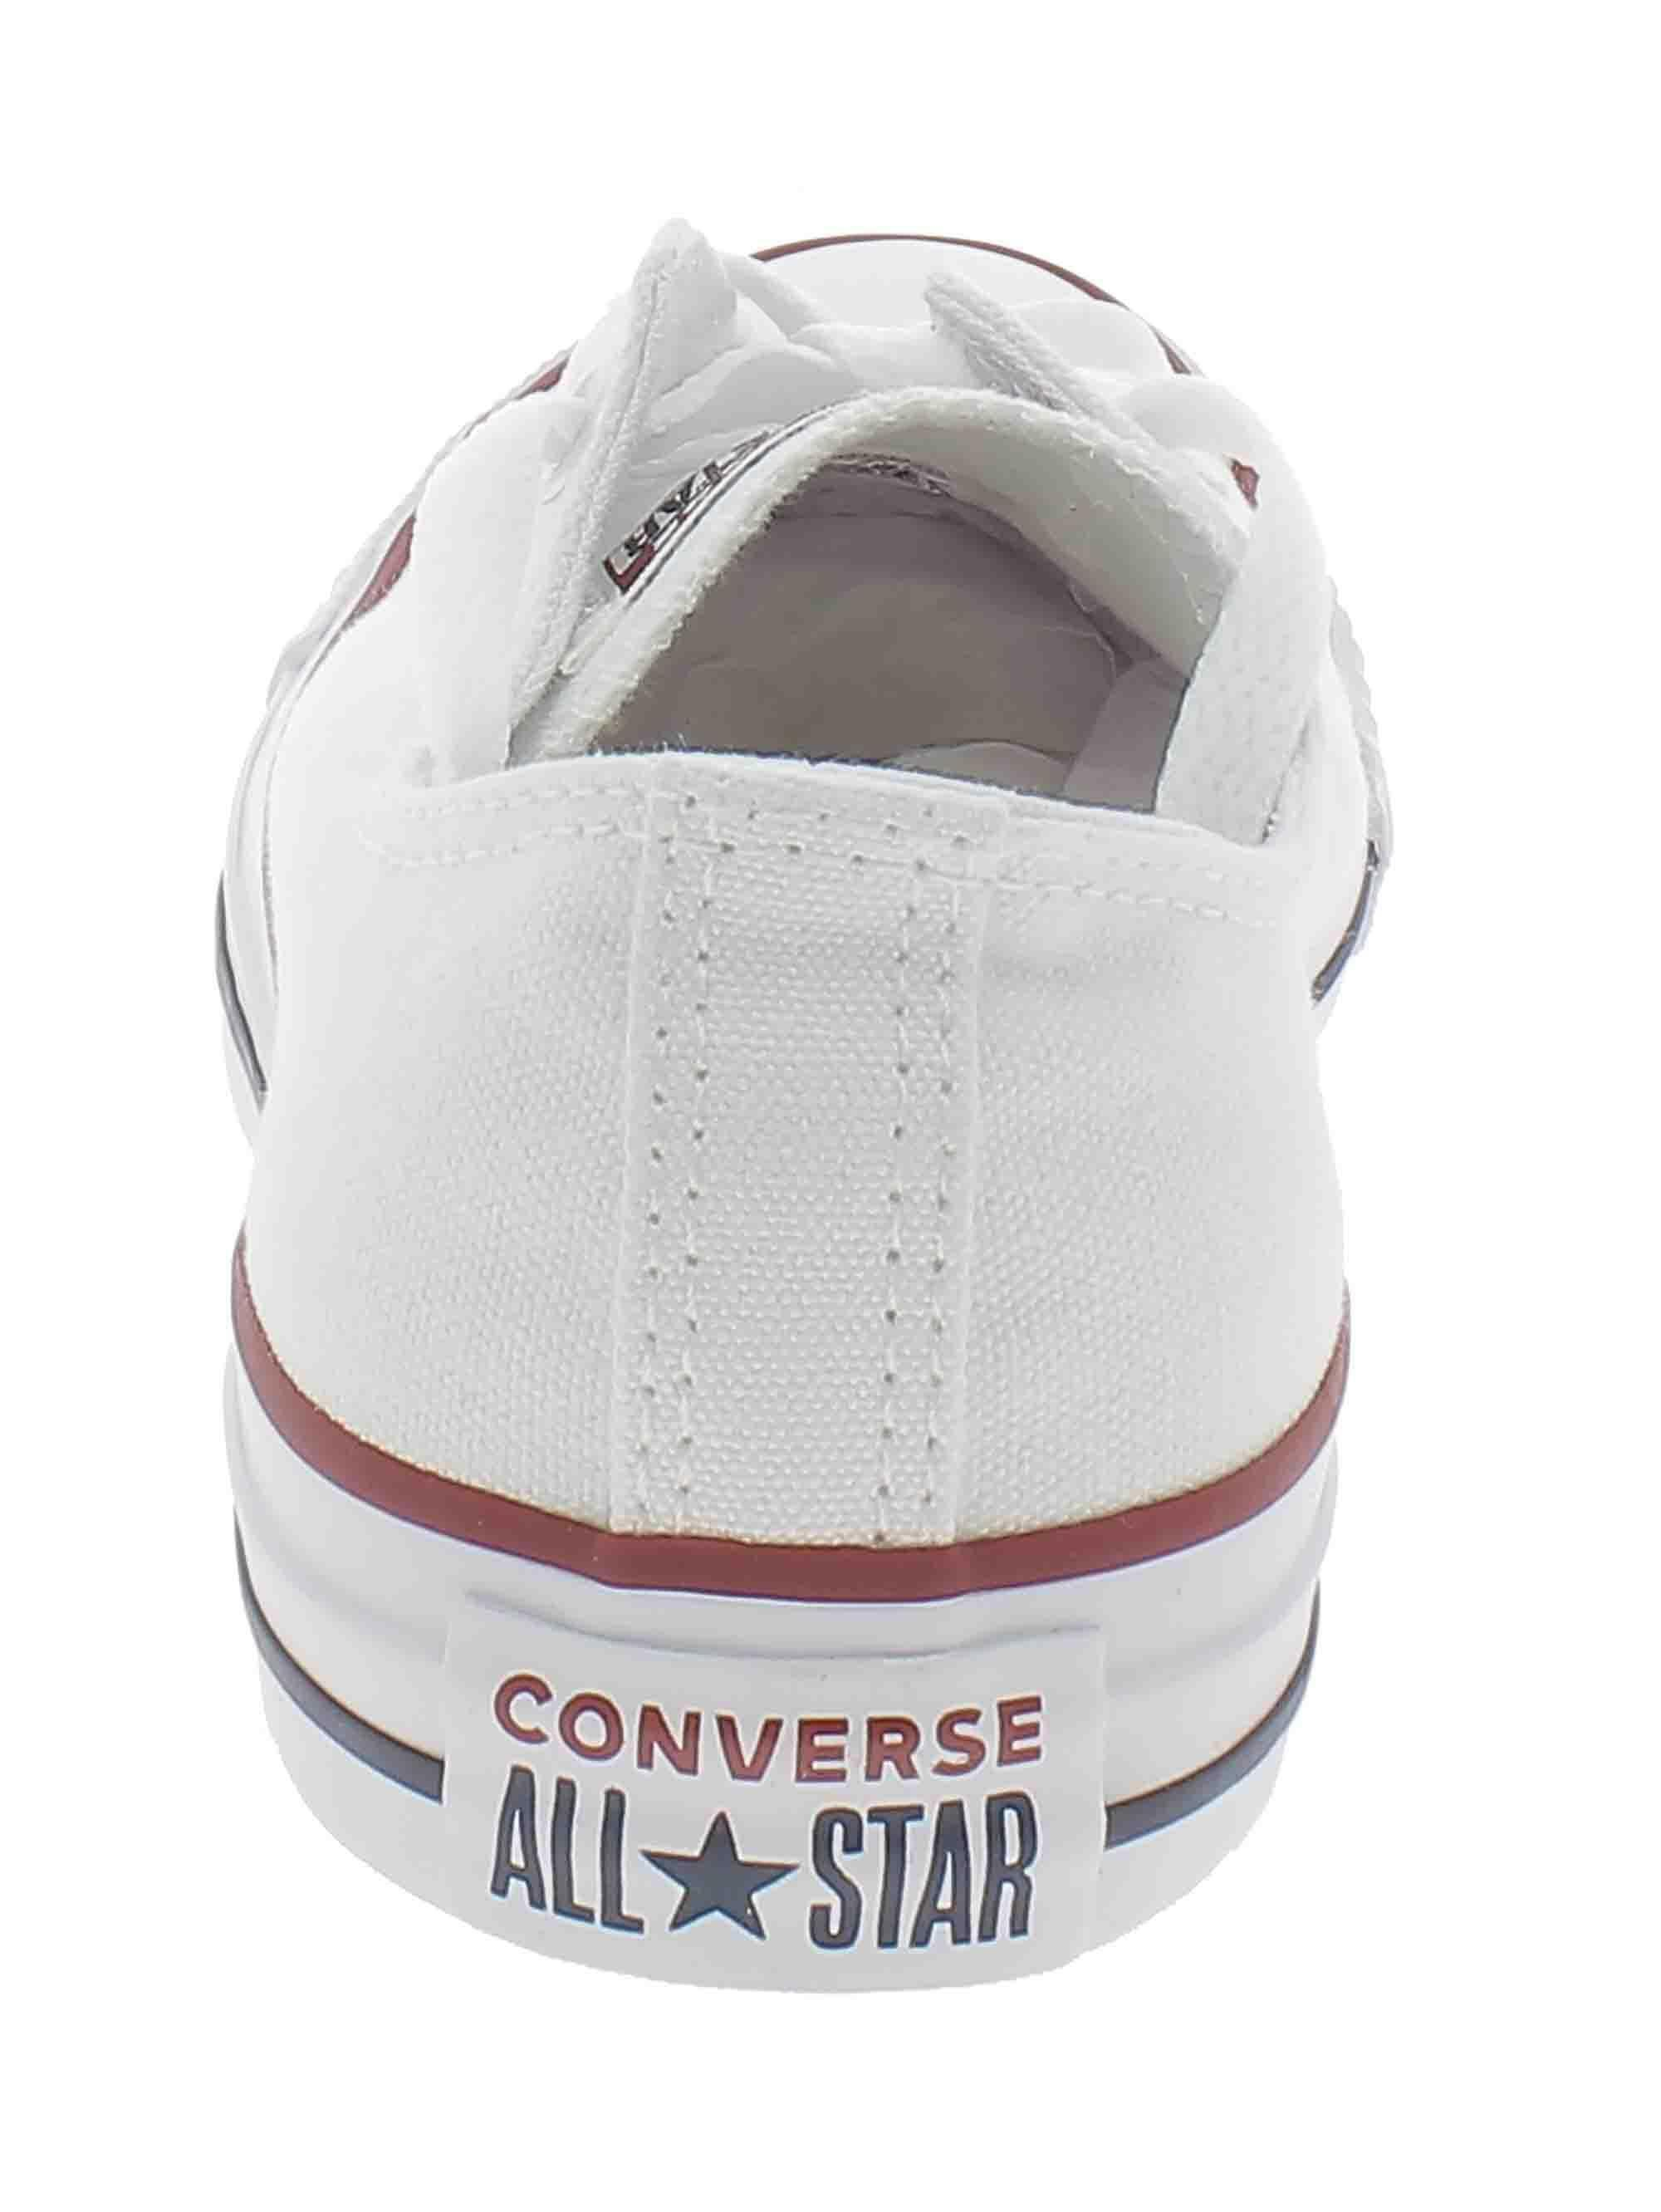 buy online 59356 9733c ... Photo 2 6  Photo 3 6  Photo 4 6. 3. CONVERSE ALL STAR OX OPTICAL CHAUSSURES  DE SPORT BASSE BLANC M7652C